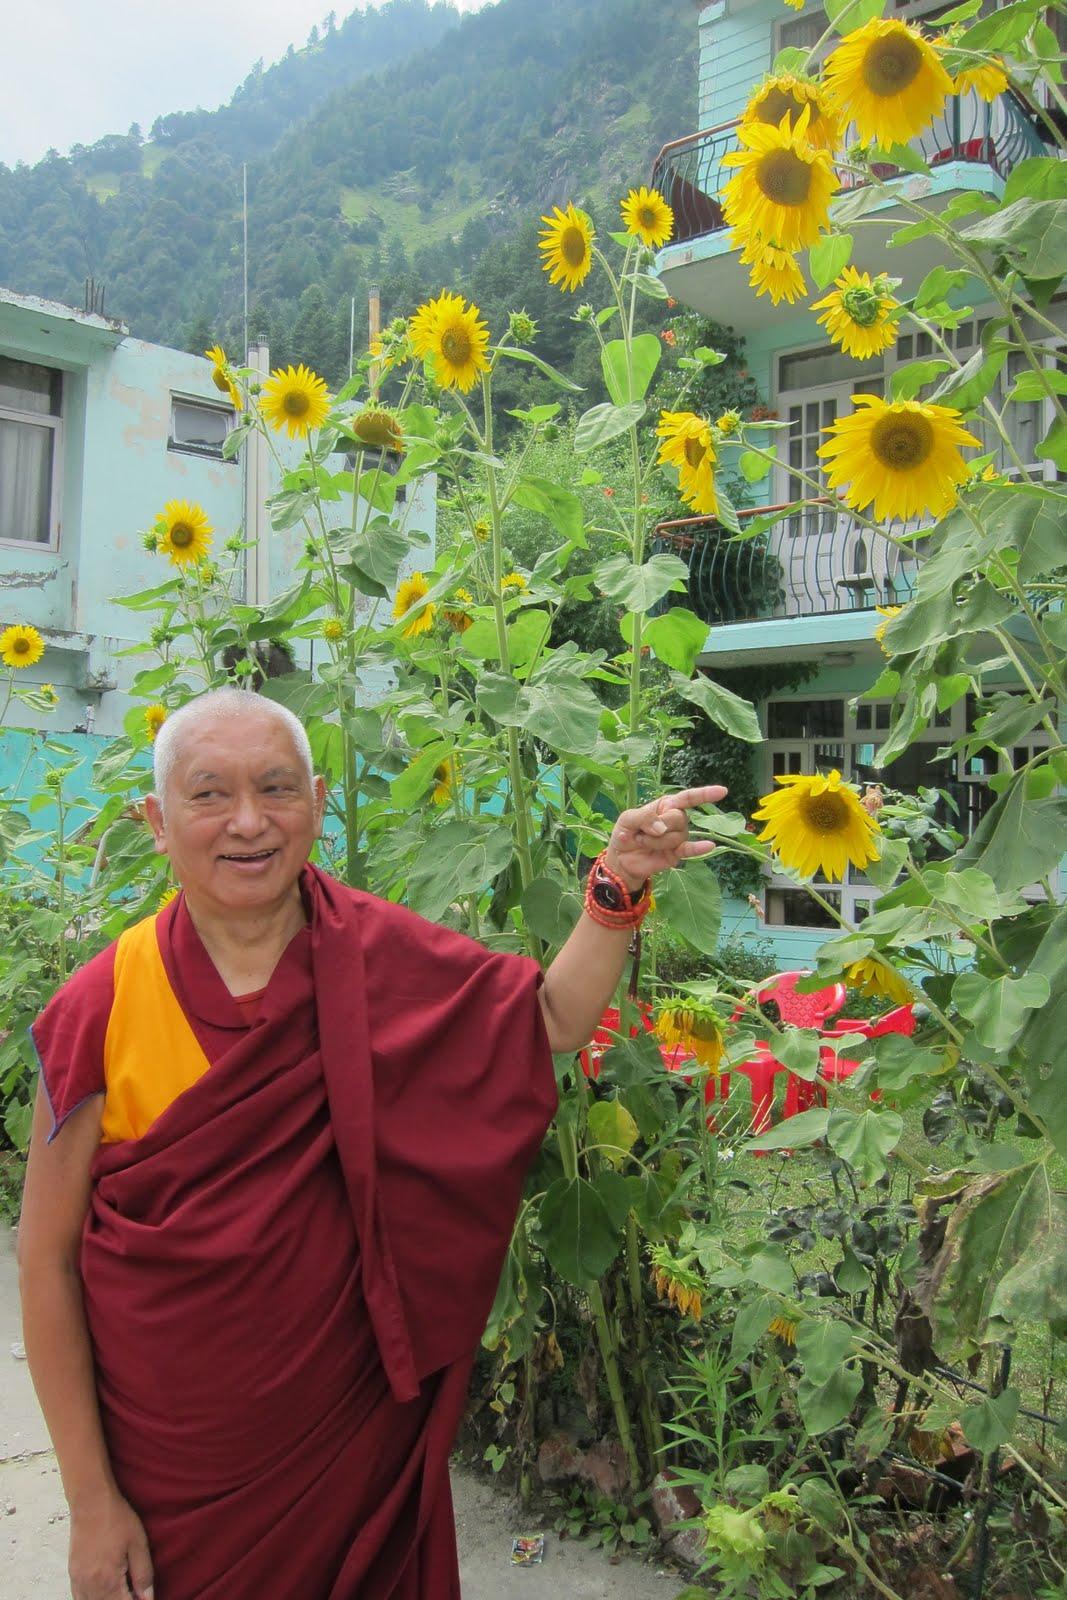 Rinpoche in Manali, India, July 30, 2013. Photo: Ven.Sarah Thresher